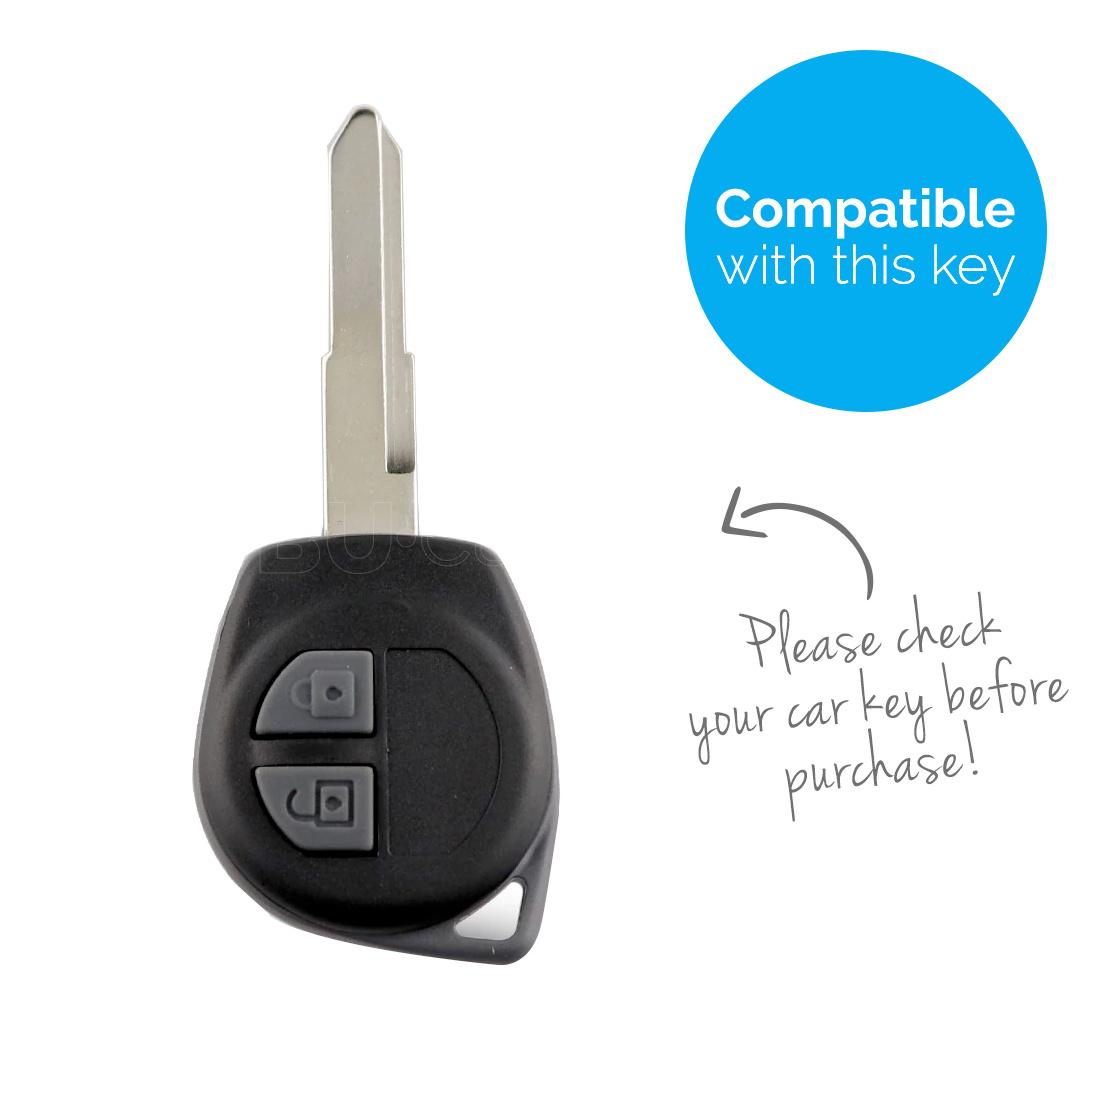 TBU car TBU car Sleutel cover compatibel met Suzuki - Silicone sleutelhoesje - beschermhoesje autosleutel - Wit